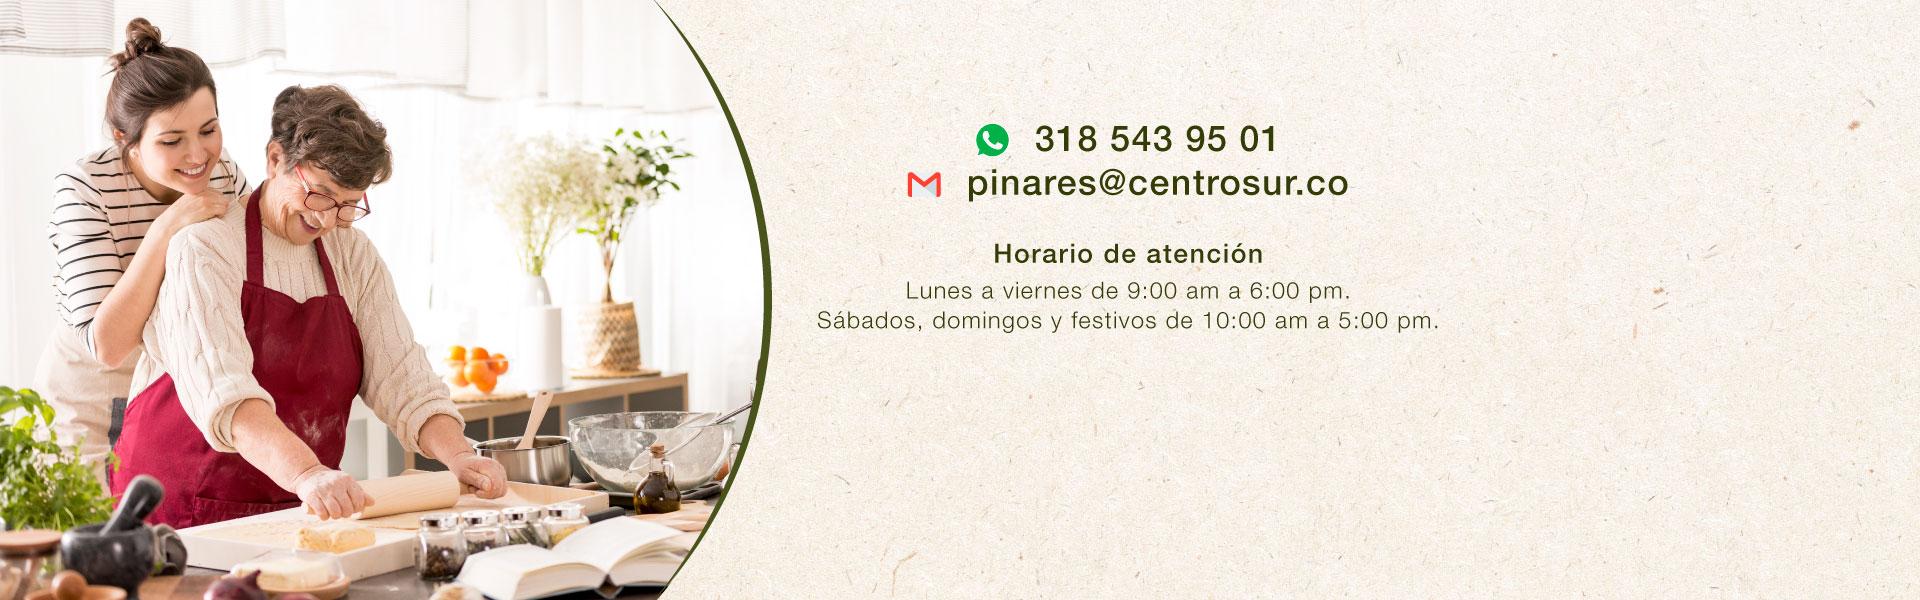 Pinares 1920